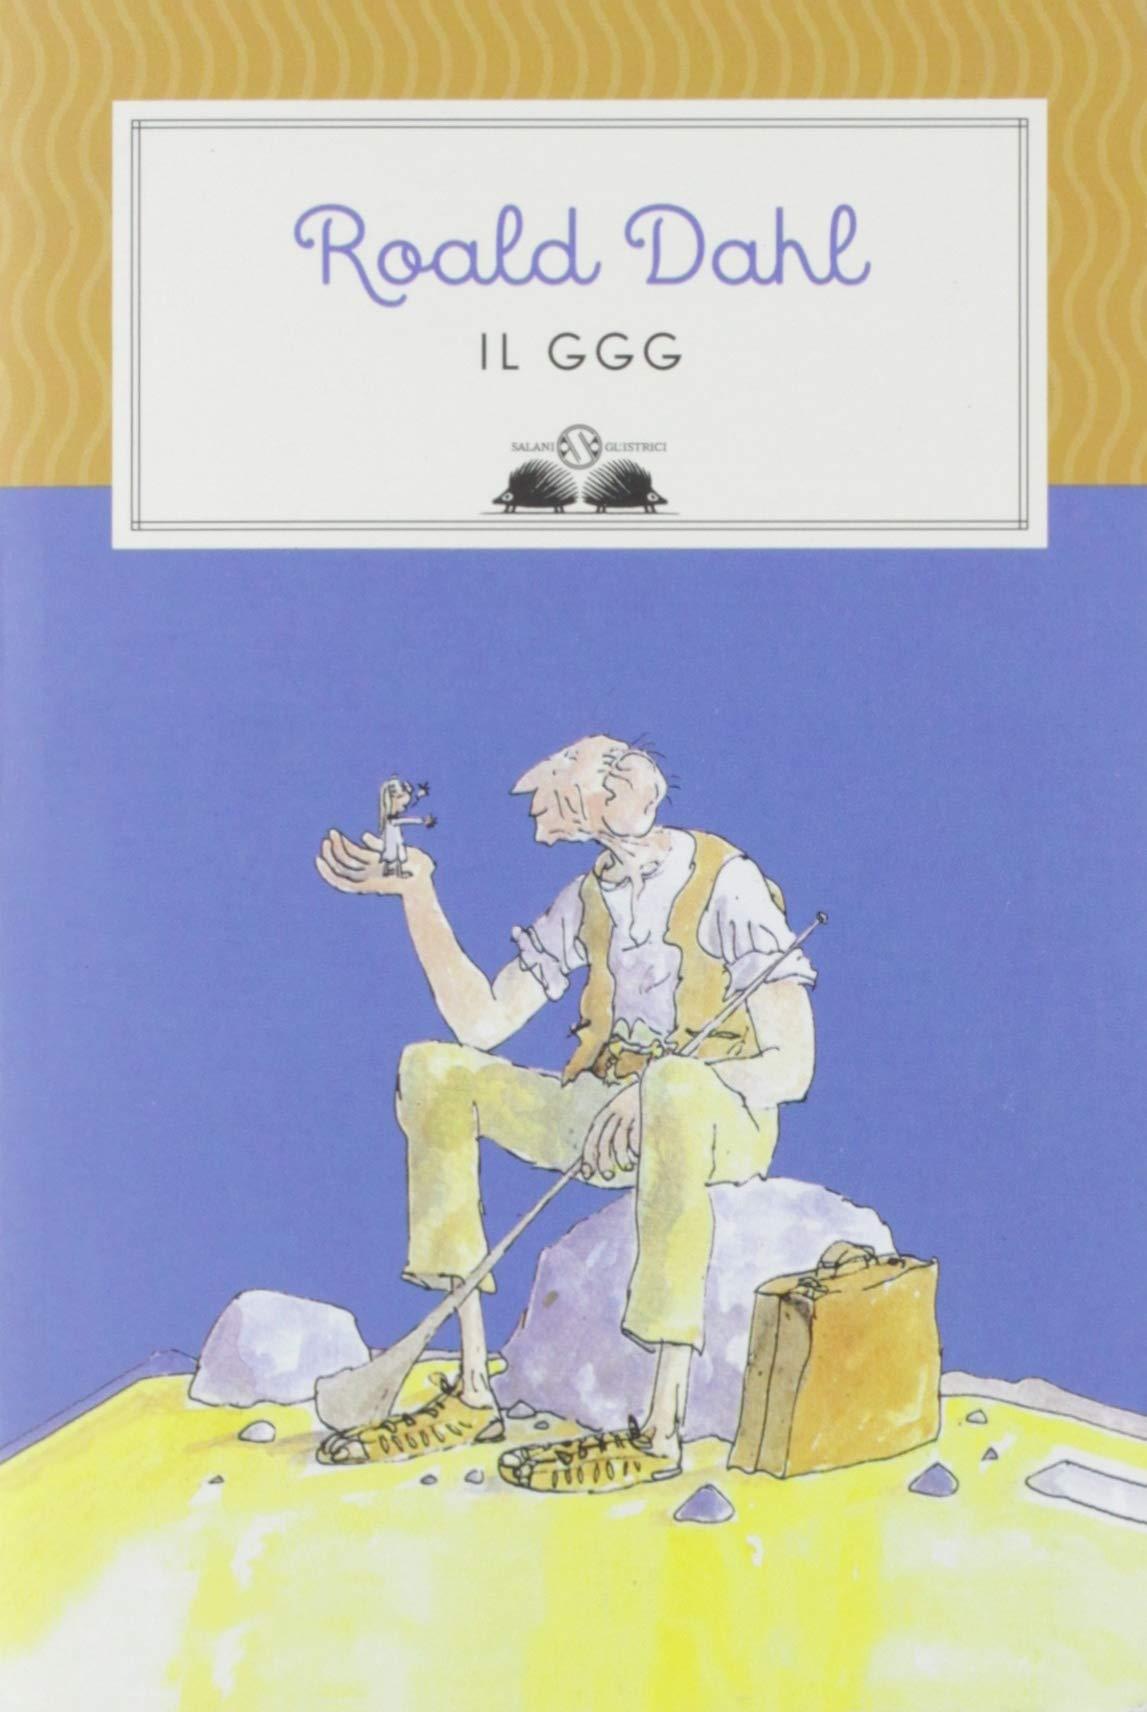 Il GGG (Glistrici): Amazon.es: Dahl, Roald, Ziliotto, D.: Libros ...